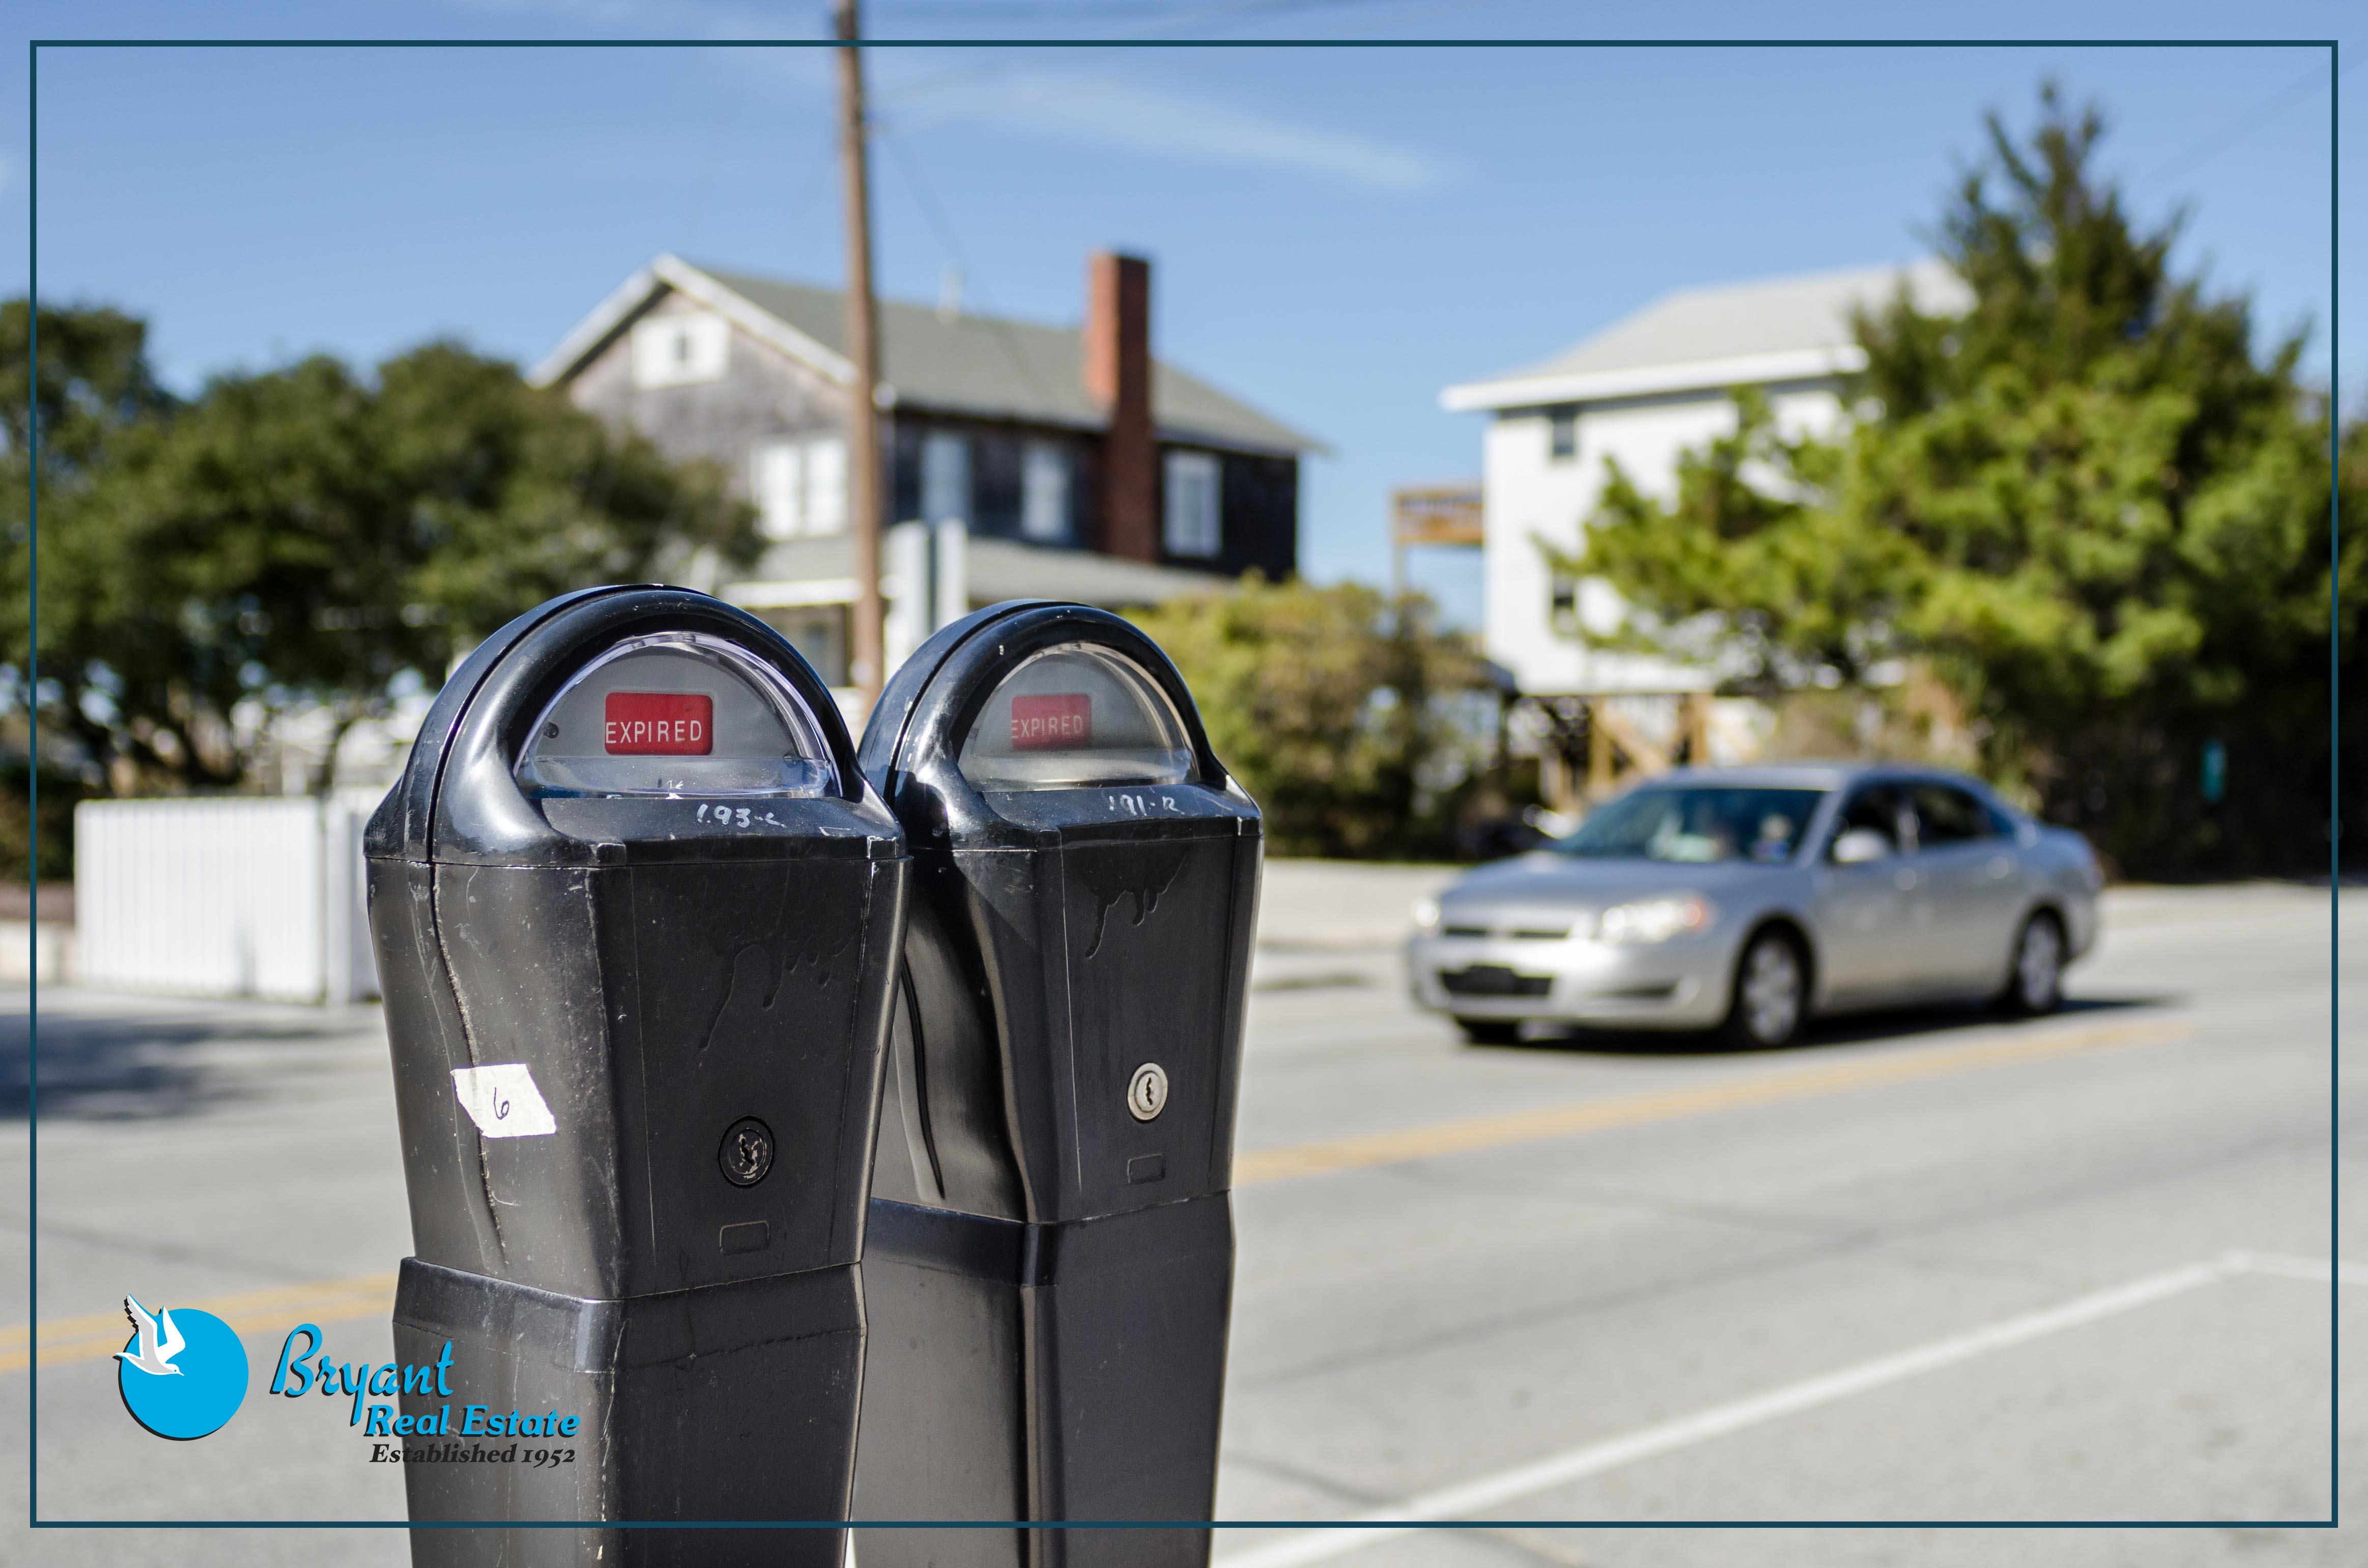 North Carolina Beach Parking Meters